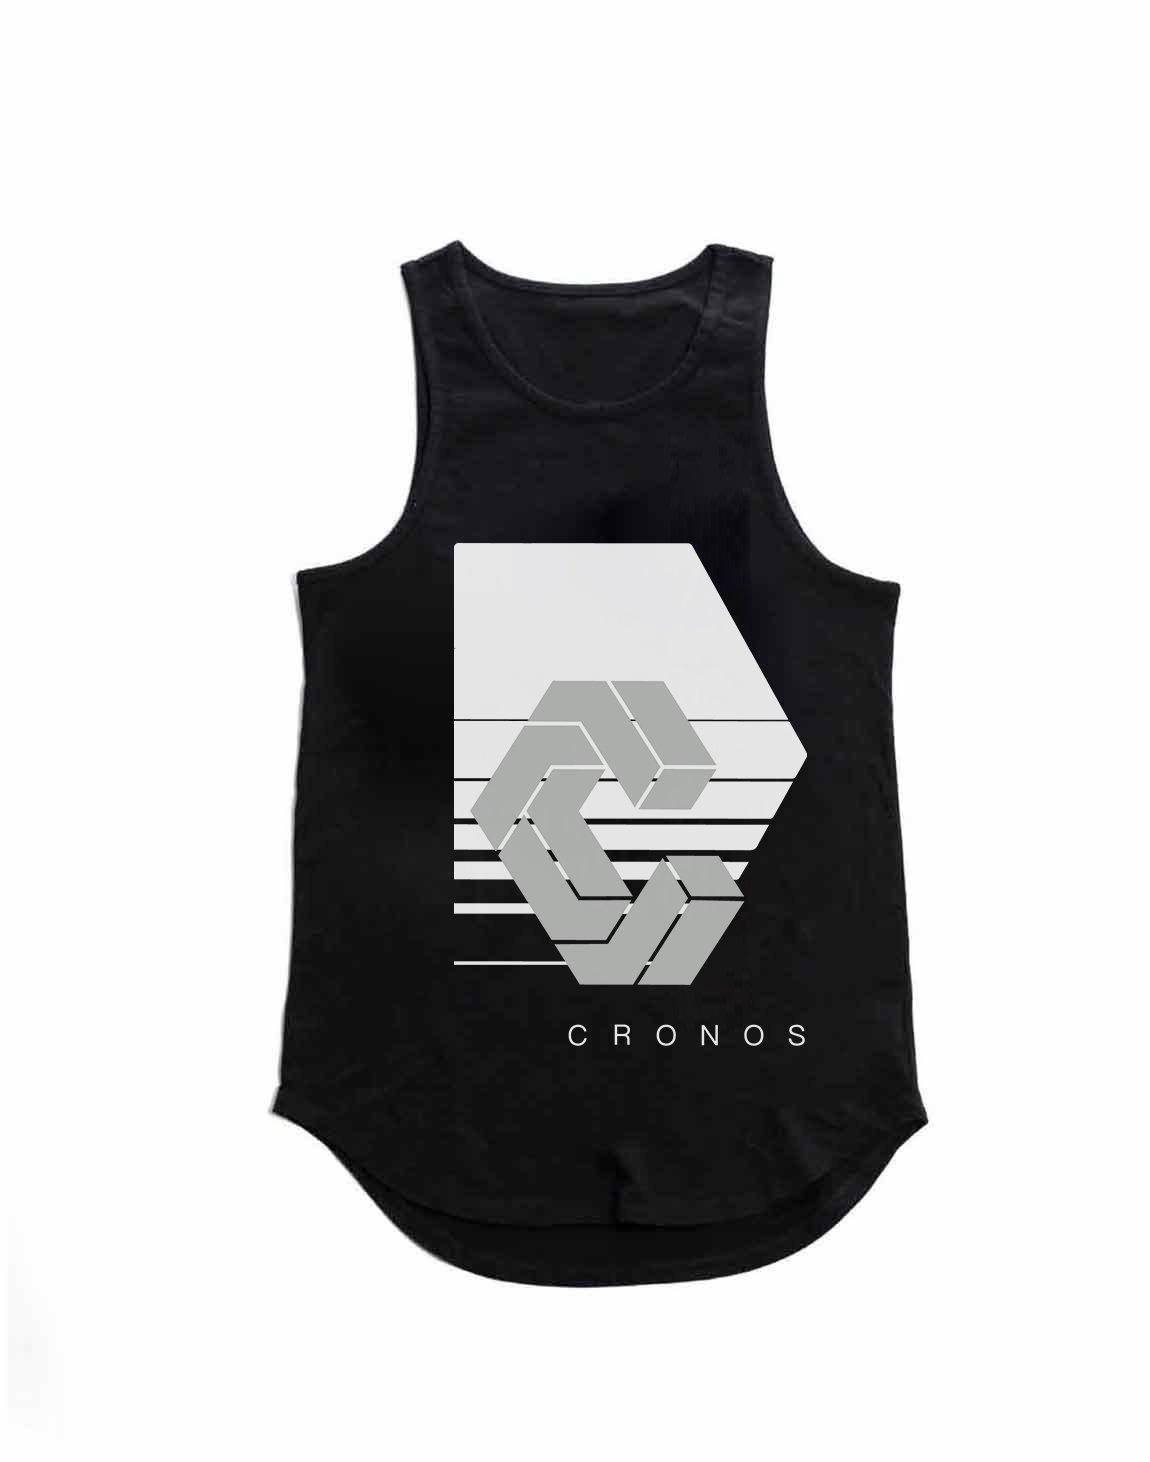 CRONOS REFLECTION LOGO TANK TOP【BLACK】